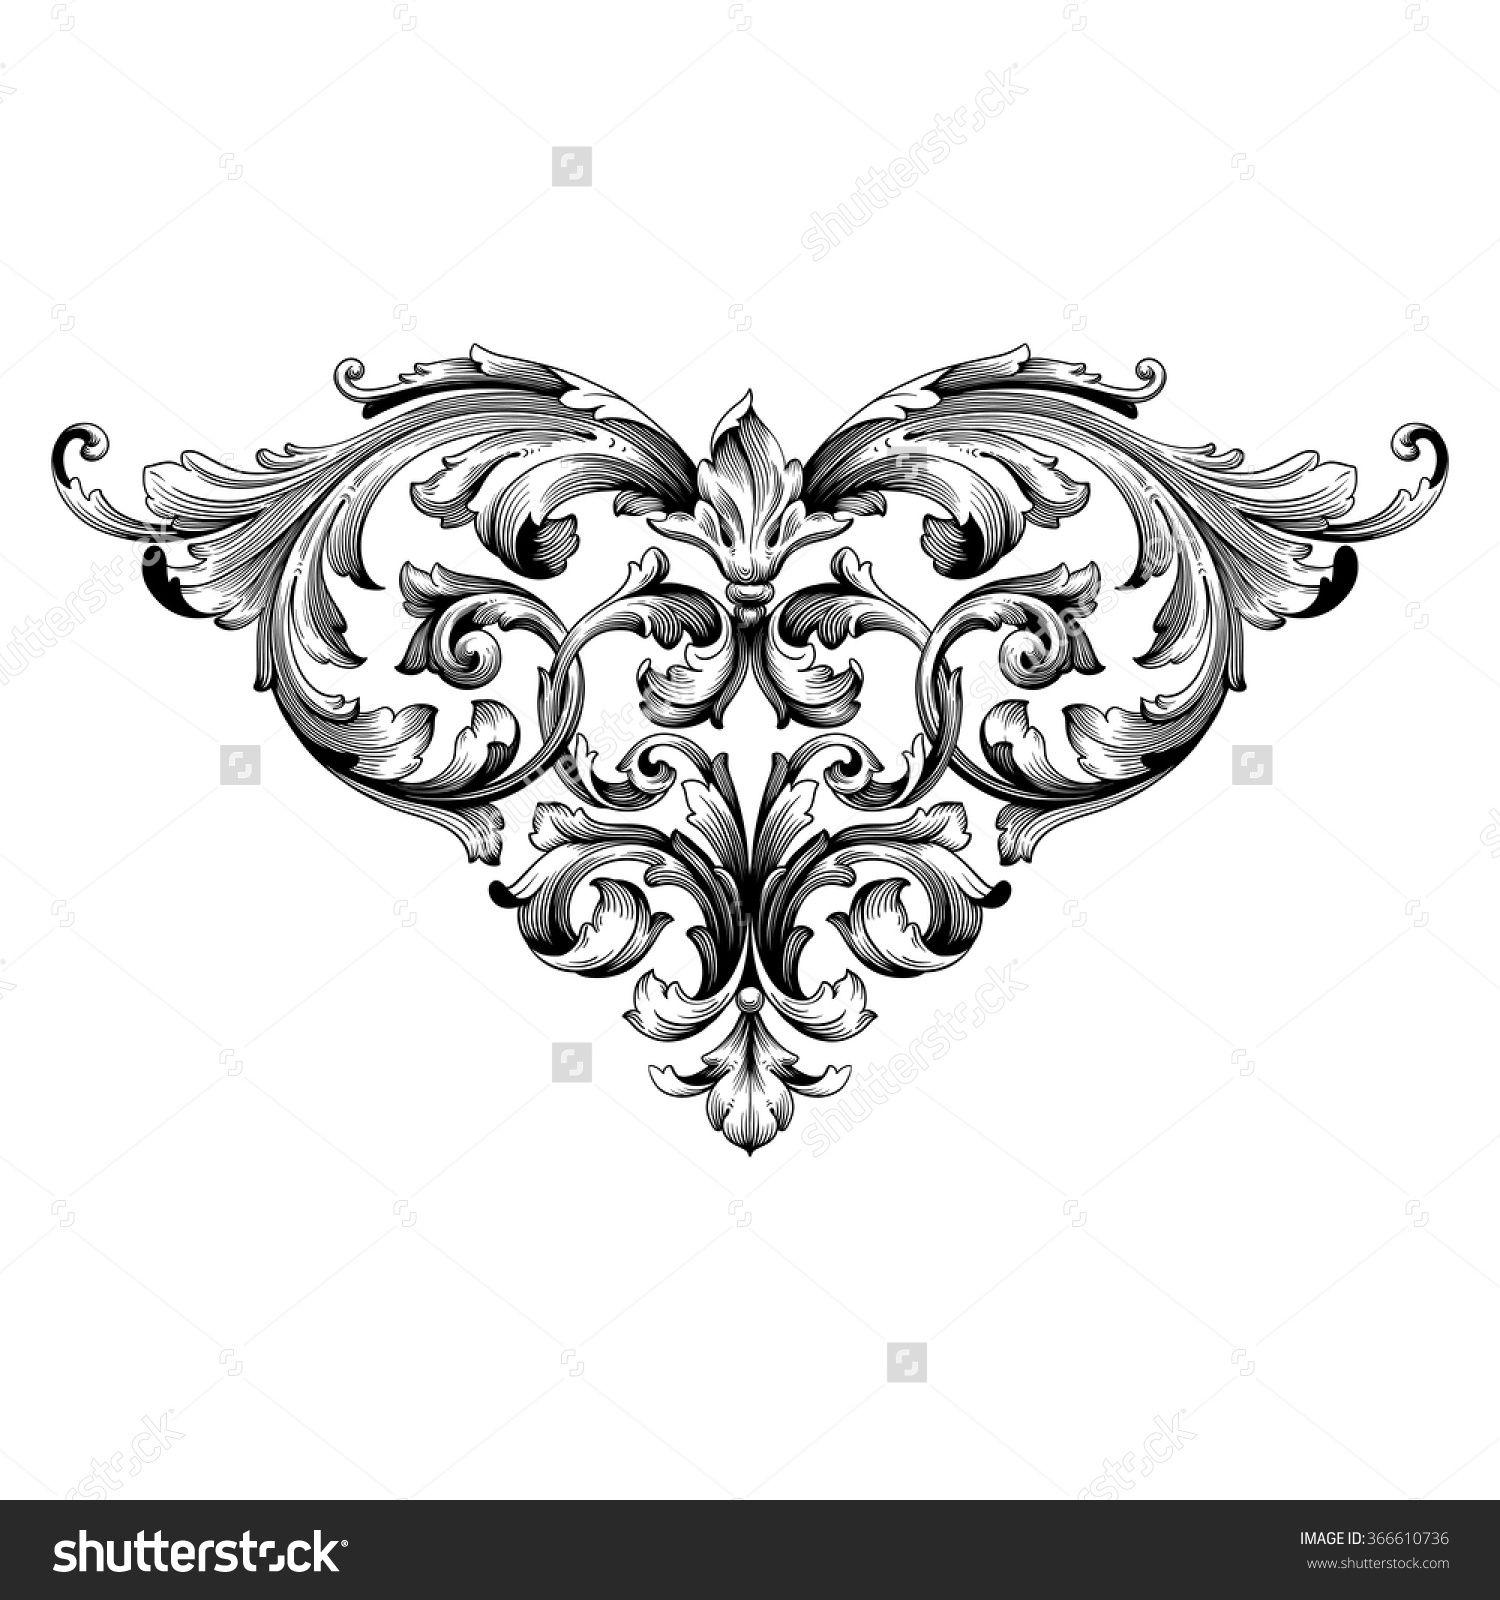 Antique Scroll Vector: Stock-vector-vintage-baroque-frame-scroll-ornament